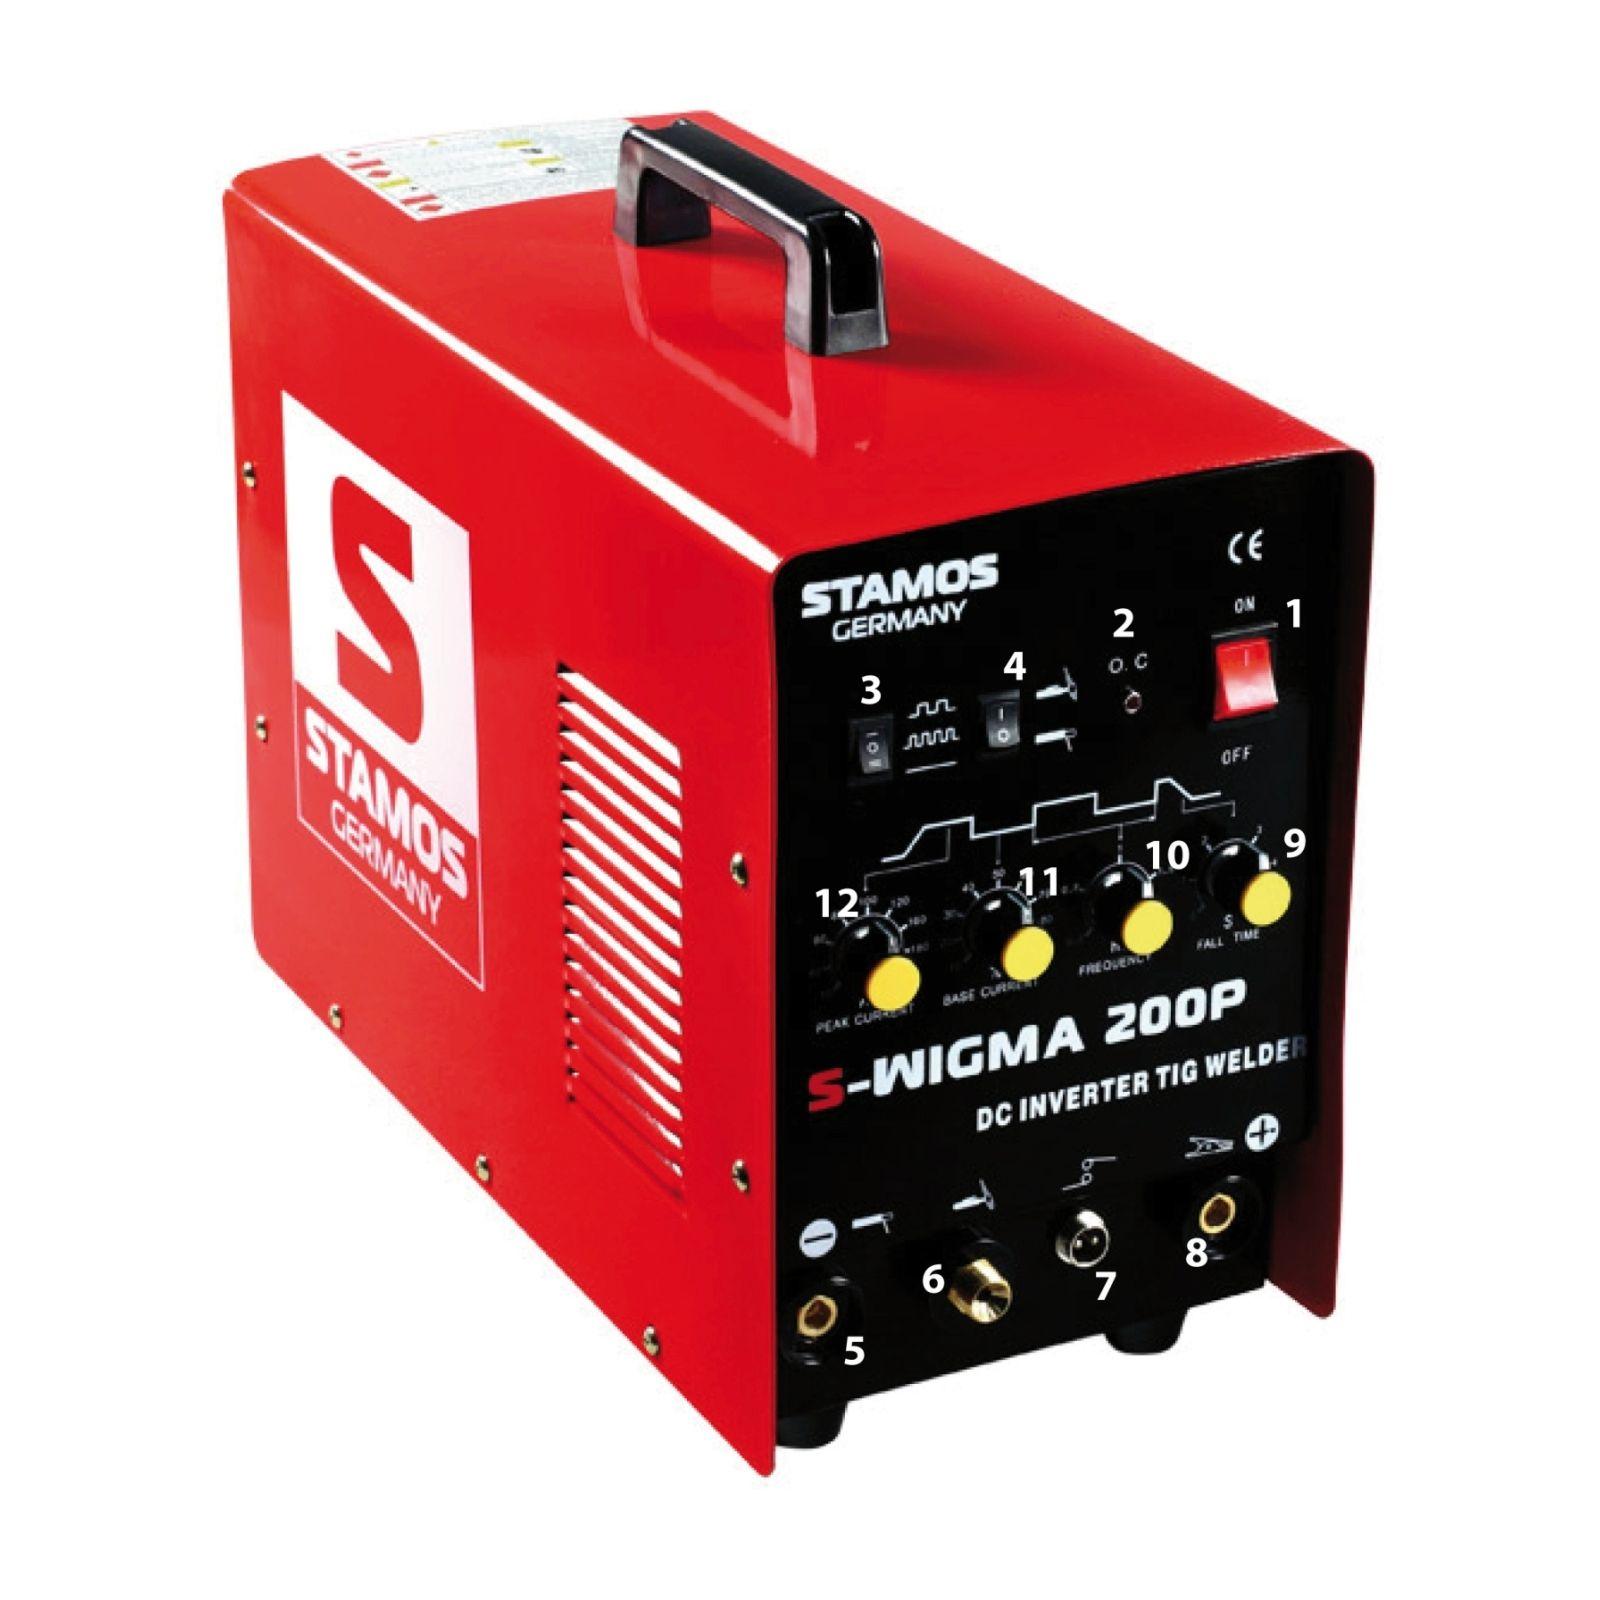 Stamos Basic WIG Schweißgerät - 200 A - 230 V - Puls S-WIGMA 200P / SPAWARKA TIG 200 Z P